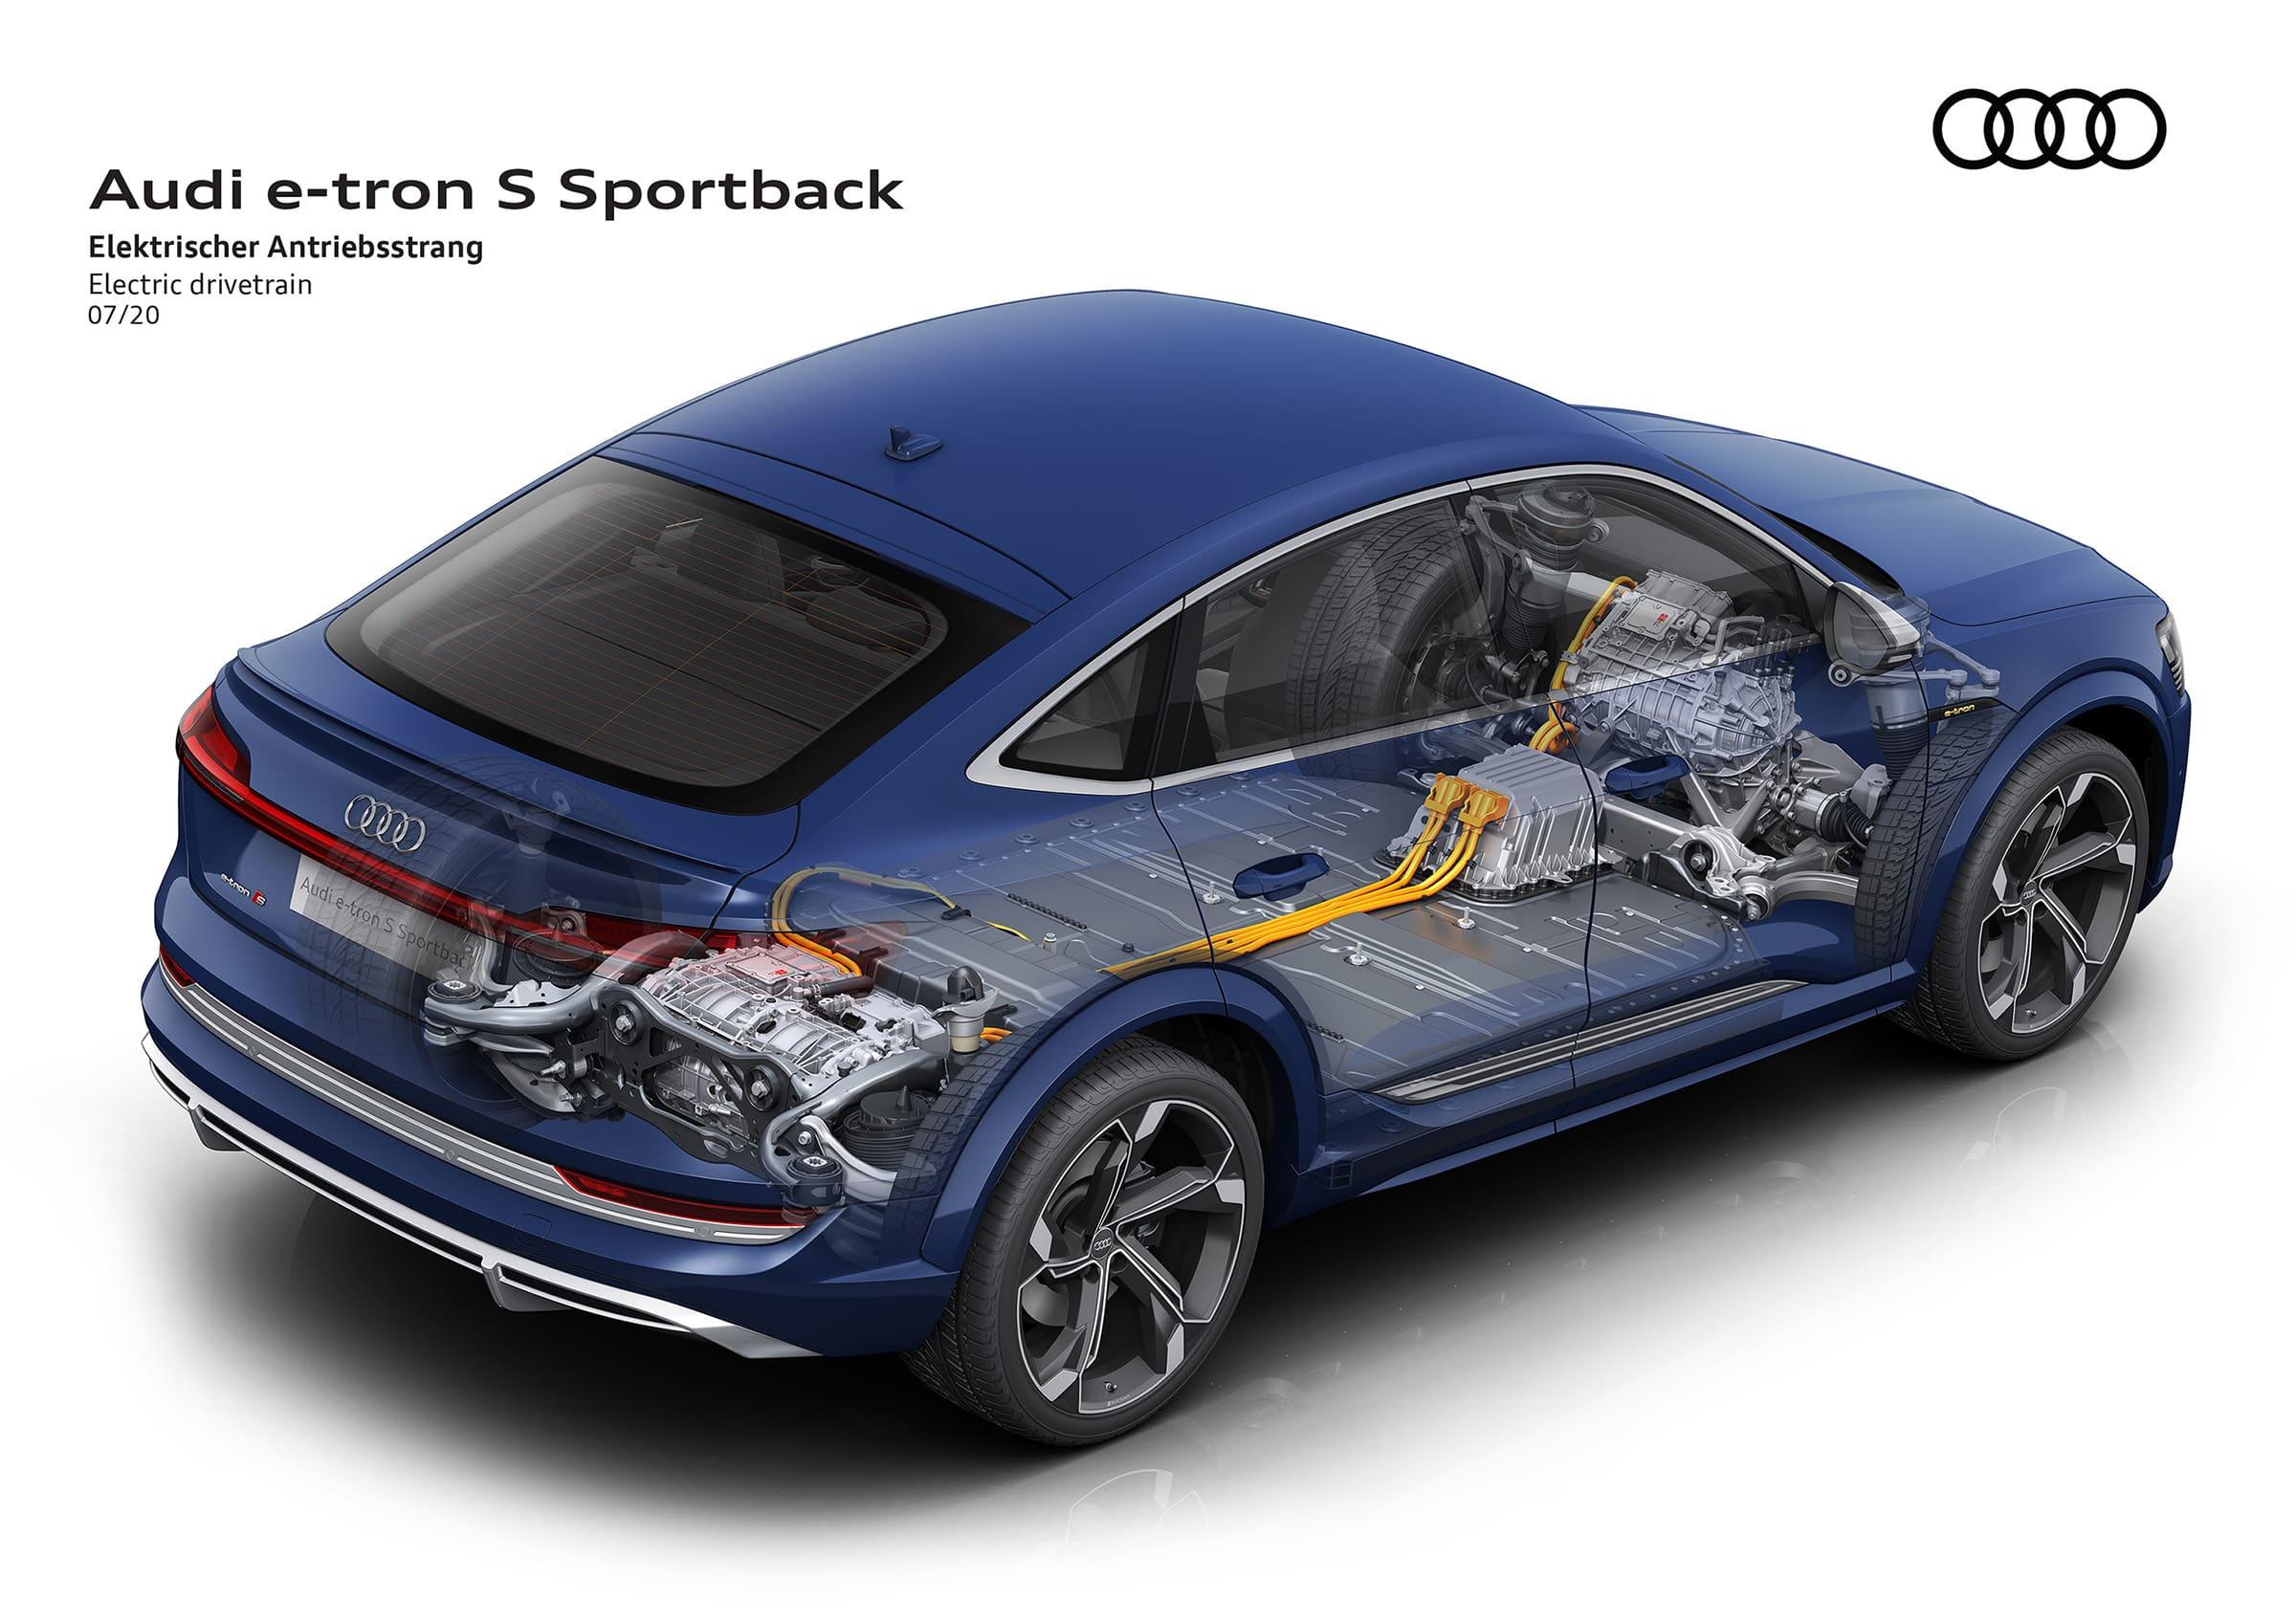 Audi e-tron S Sportback - Ηλεκτρικό σύστημα μετάδοσης κίνησης